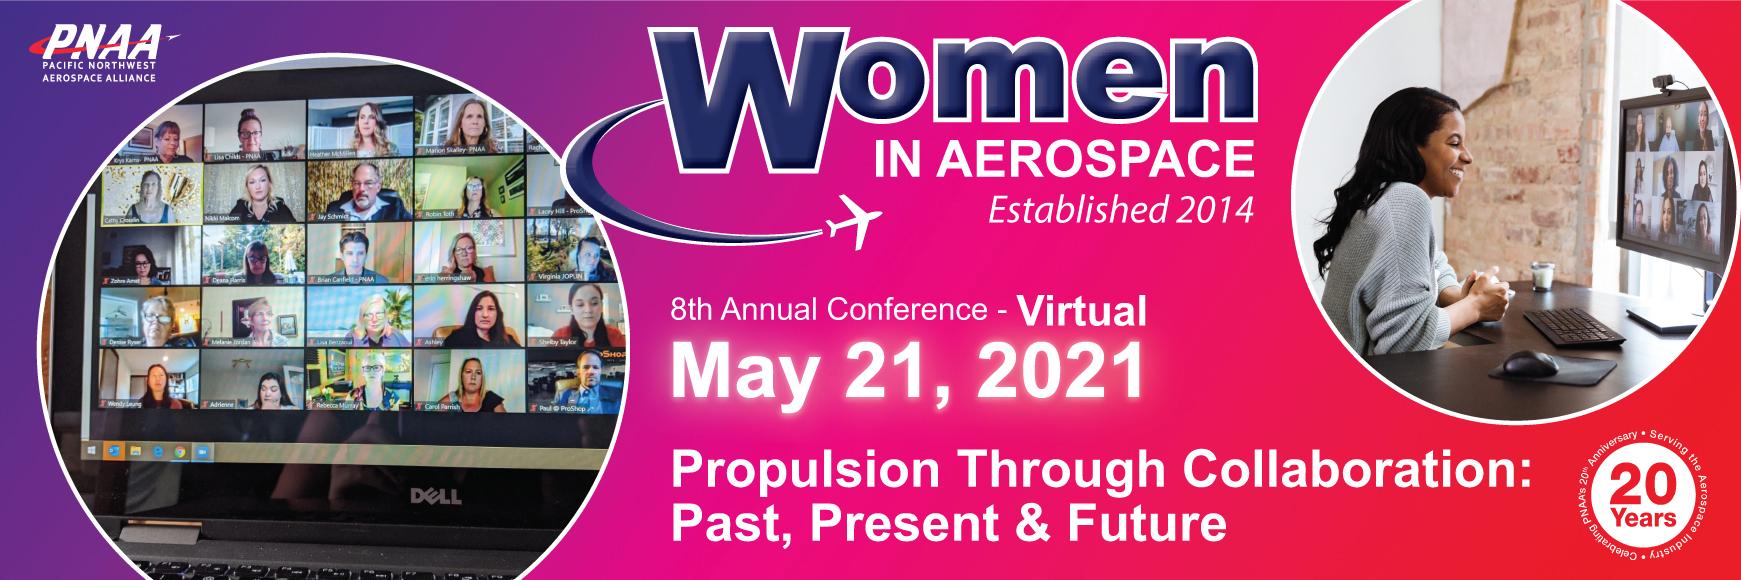 Virtual_Women_in_Aerospace_Header